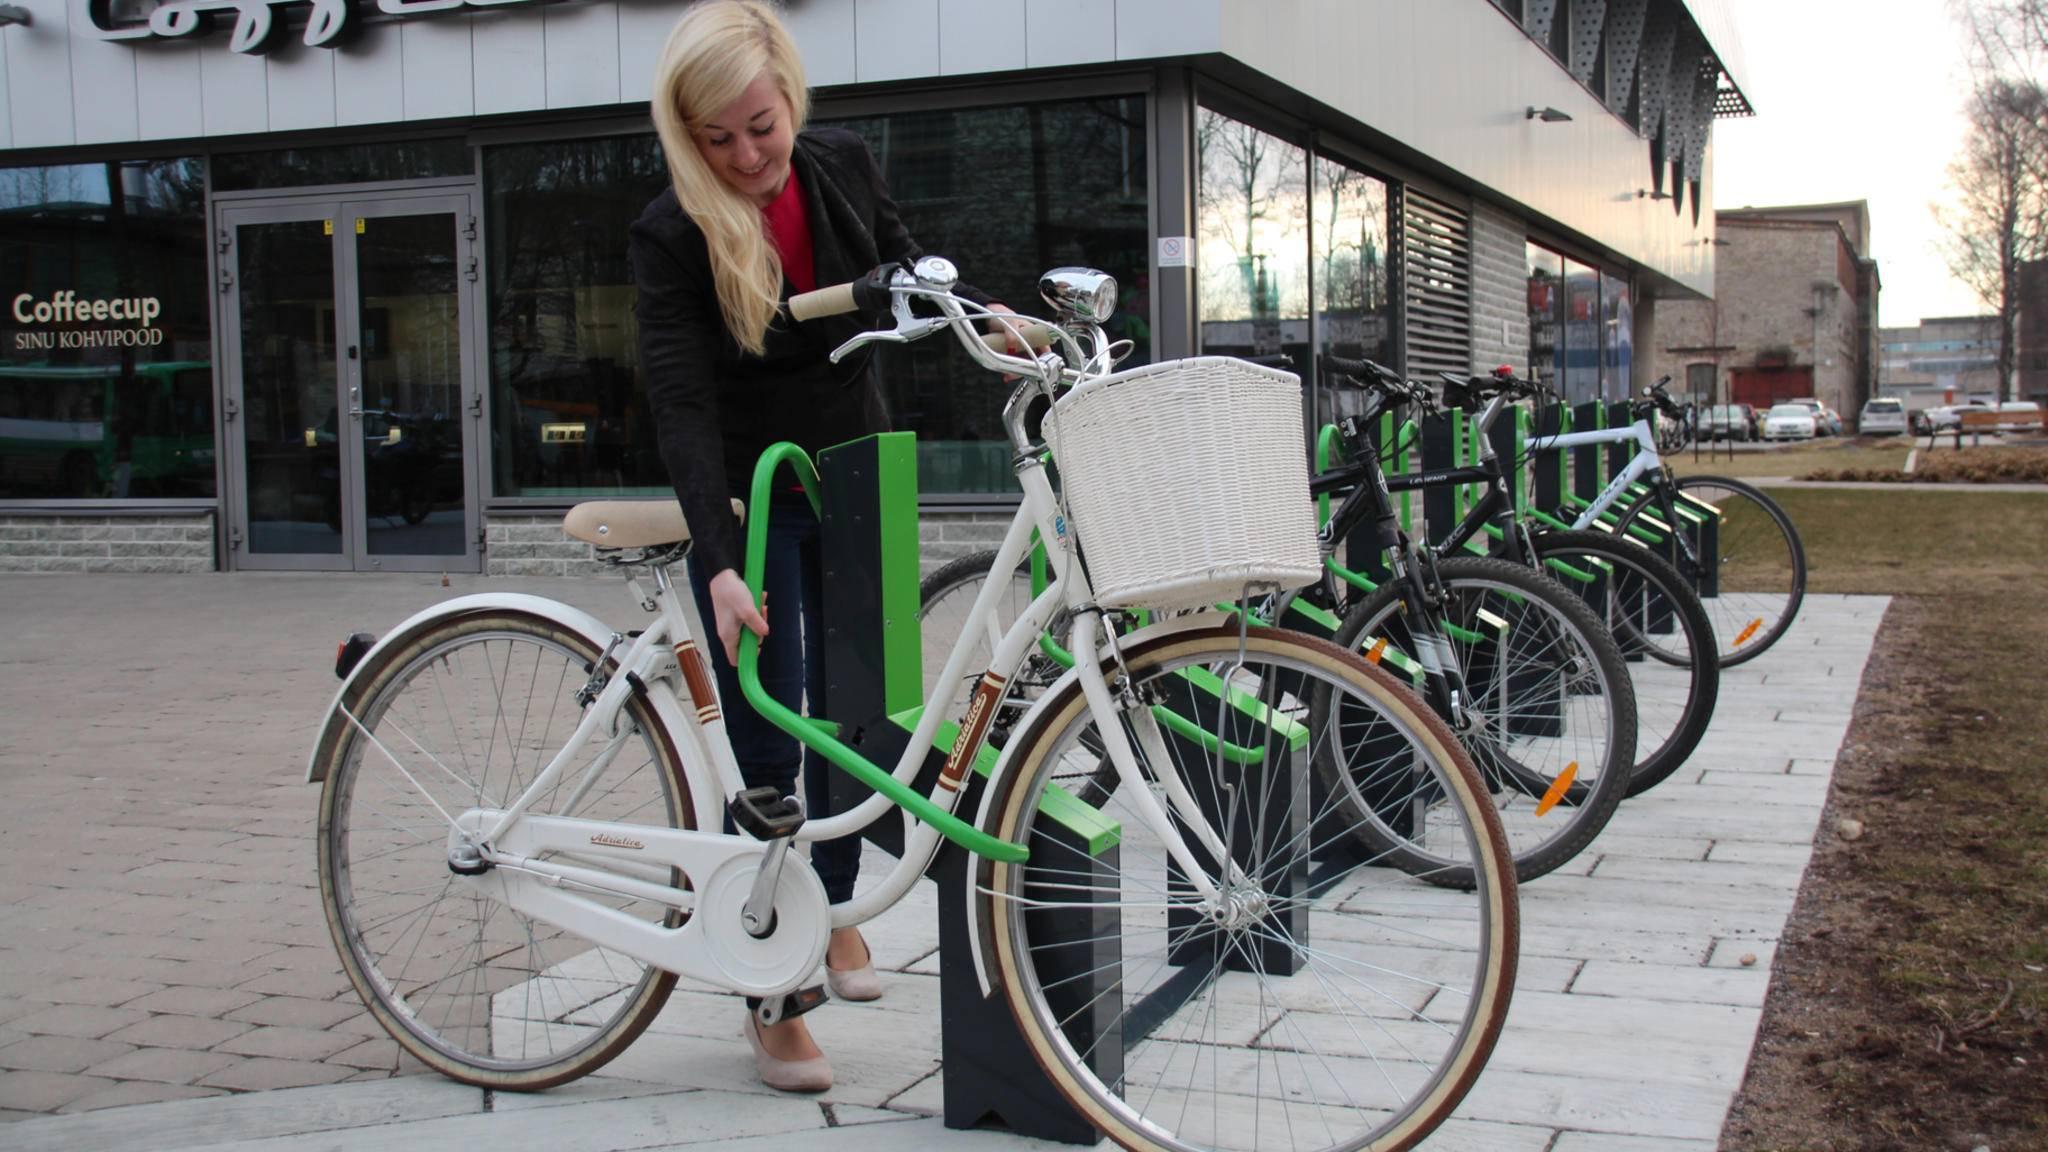 An den Bikeep-Stationen kann das Fahrrad sicher angeschlossen werden.